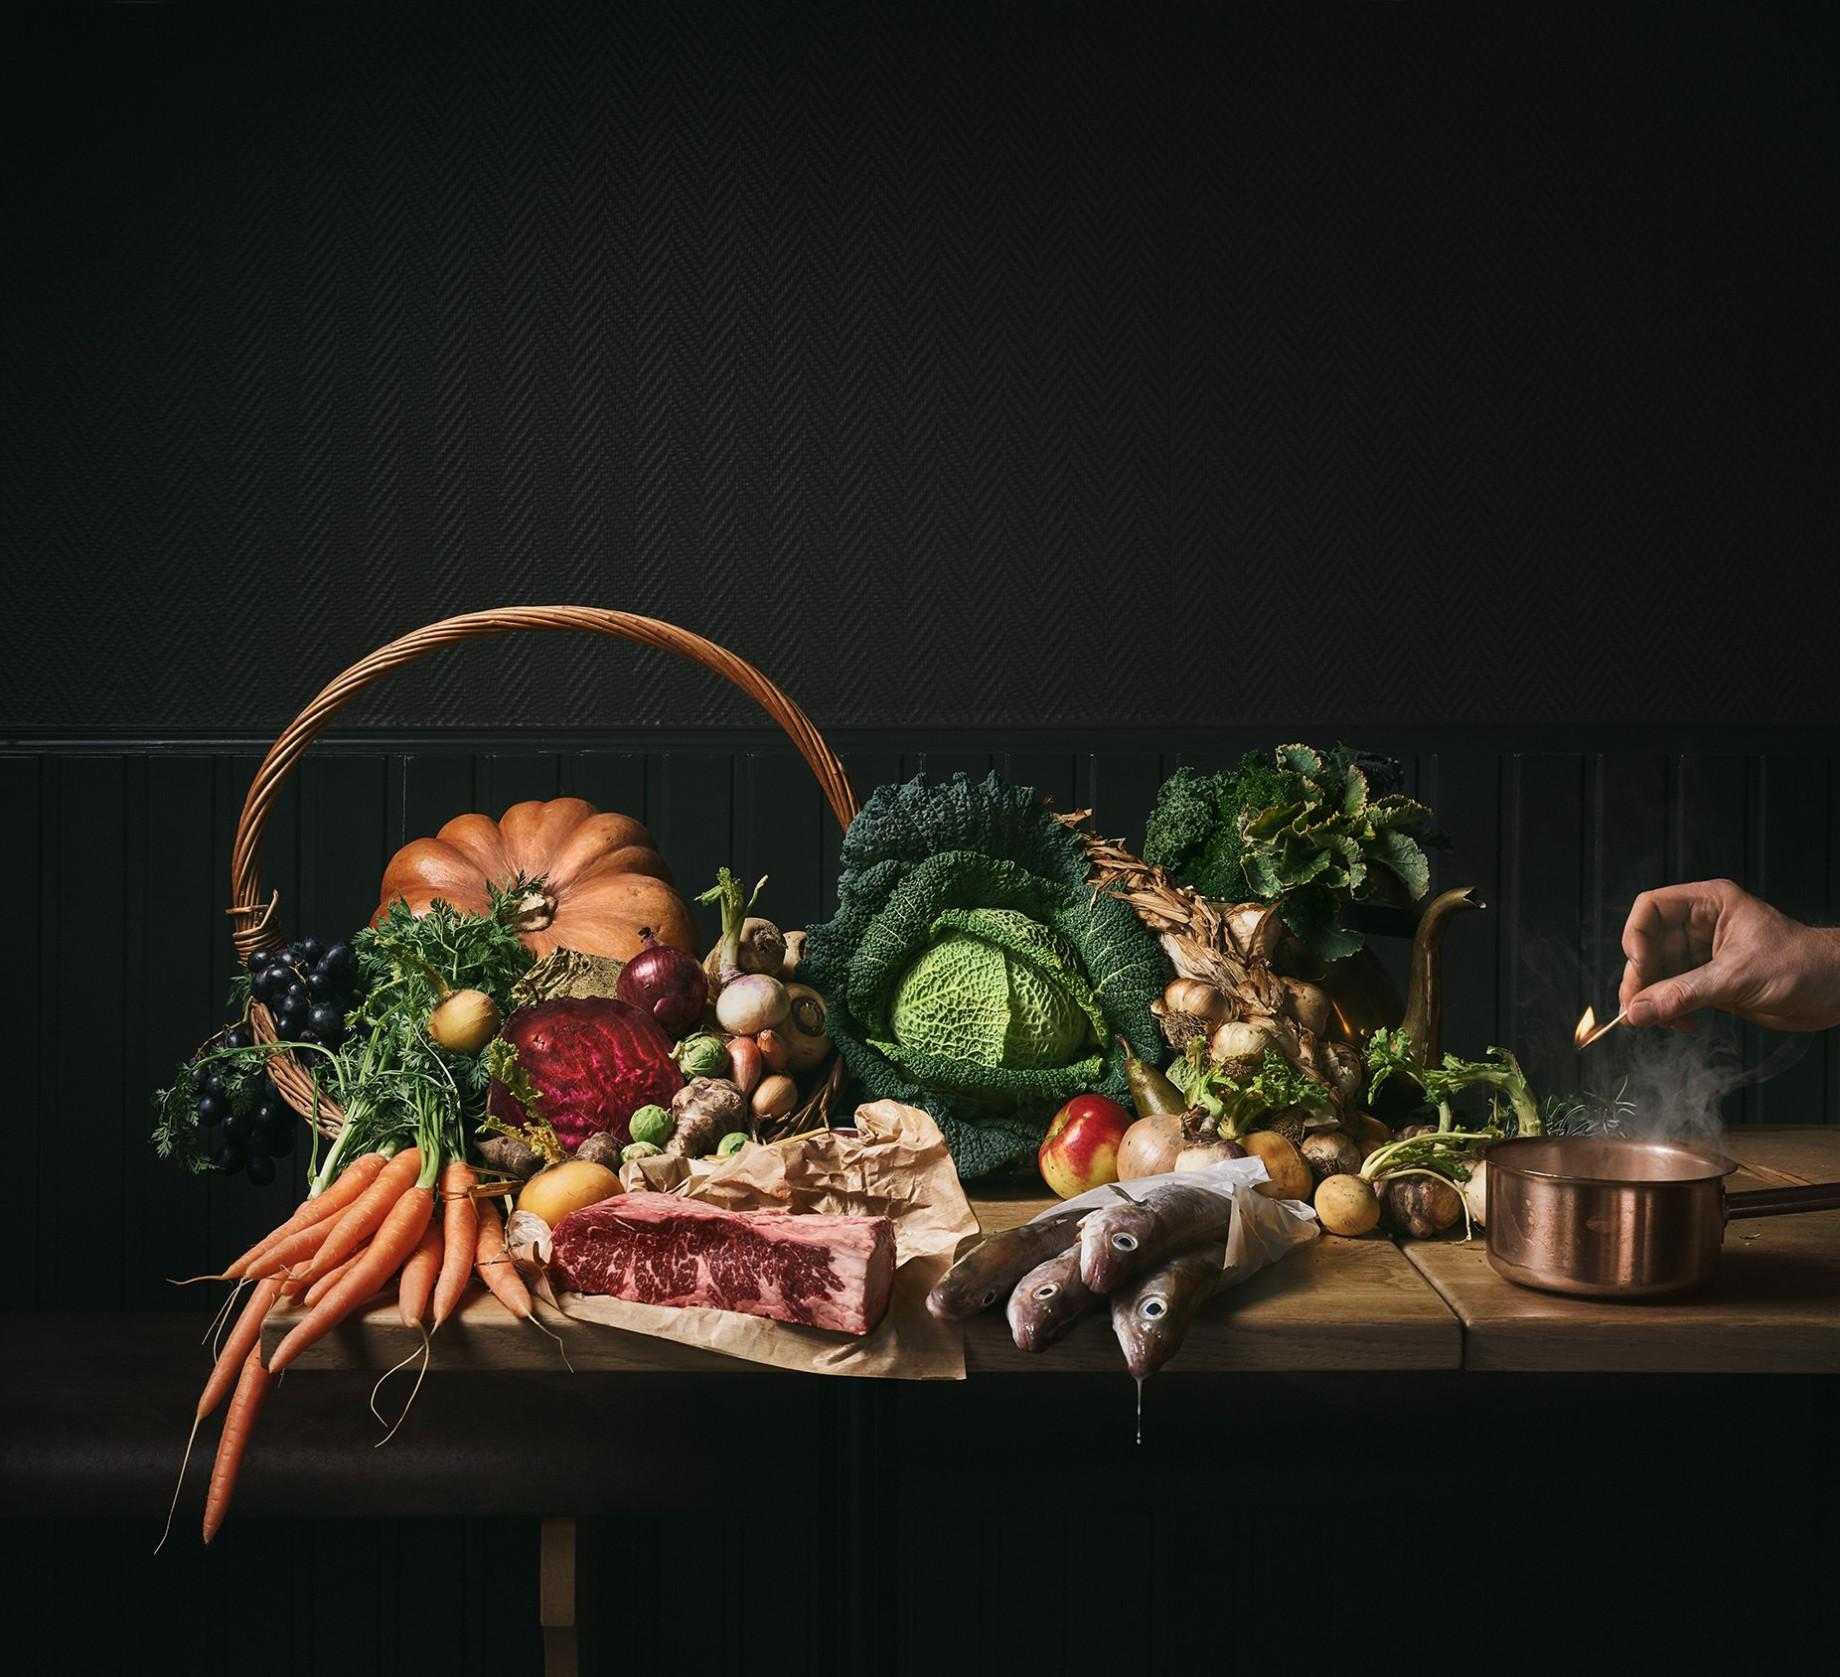 potes-au-feu_food_web-1